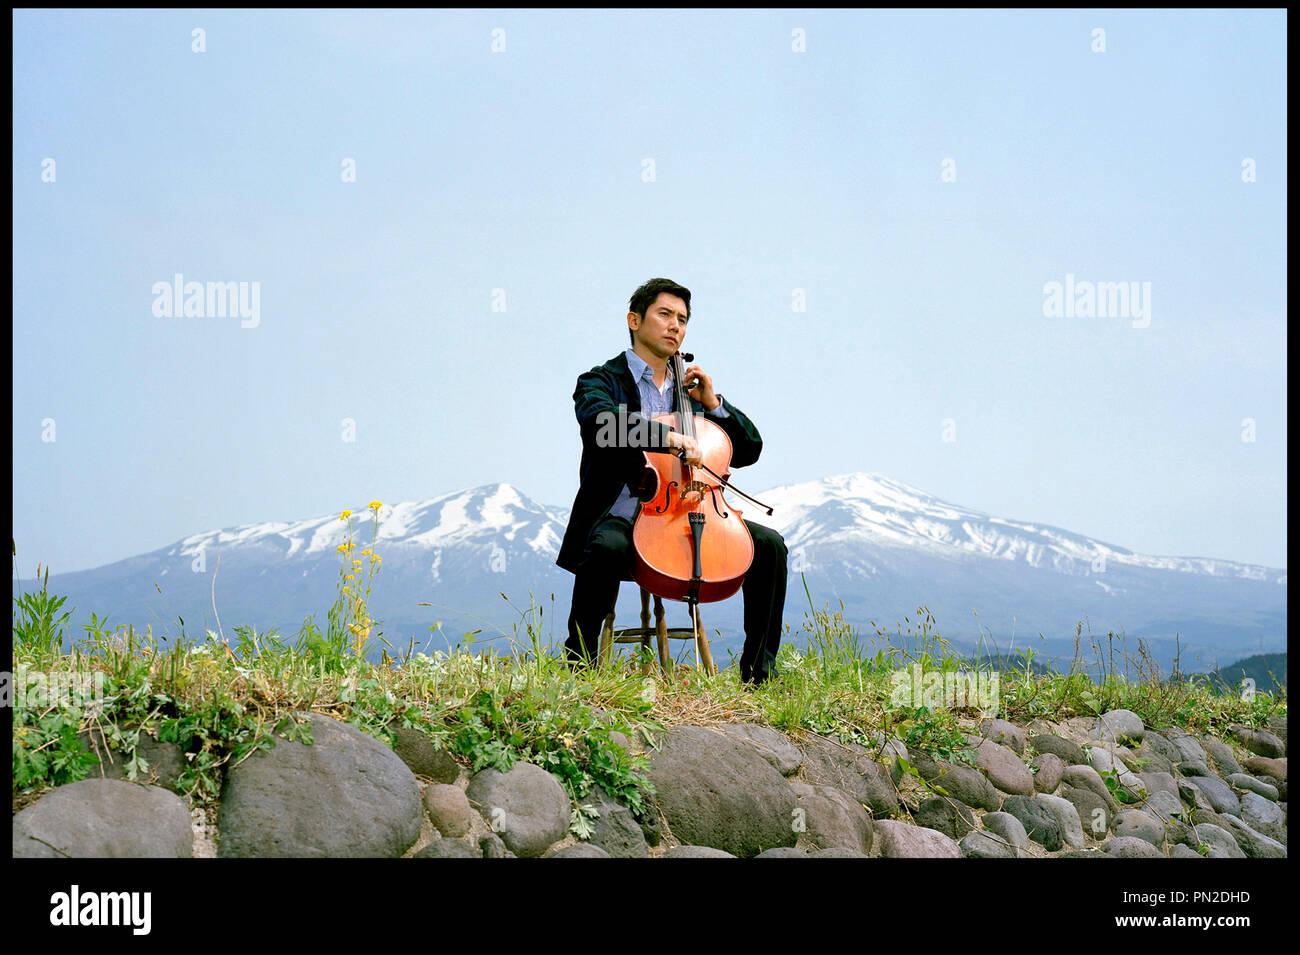 Prod DB © Shochiku Company / DR DEPARTURES (OKURIBITO) de Yojiro Takita 2008 JAP. avec Masahiro Motoki violoncelle, musicien, instrument de musique - Stock Image